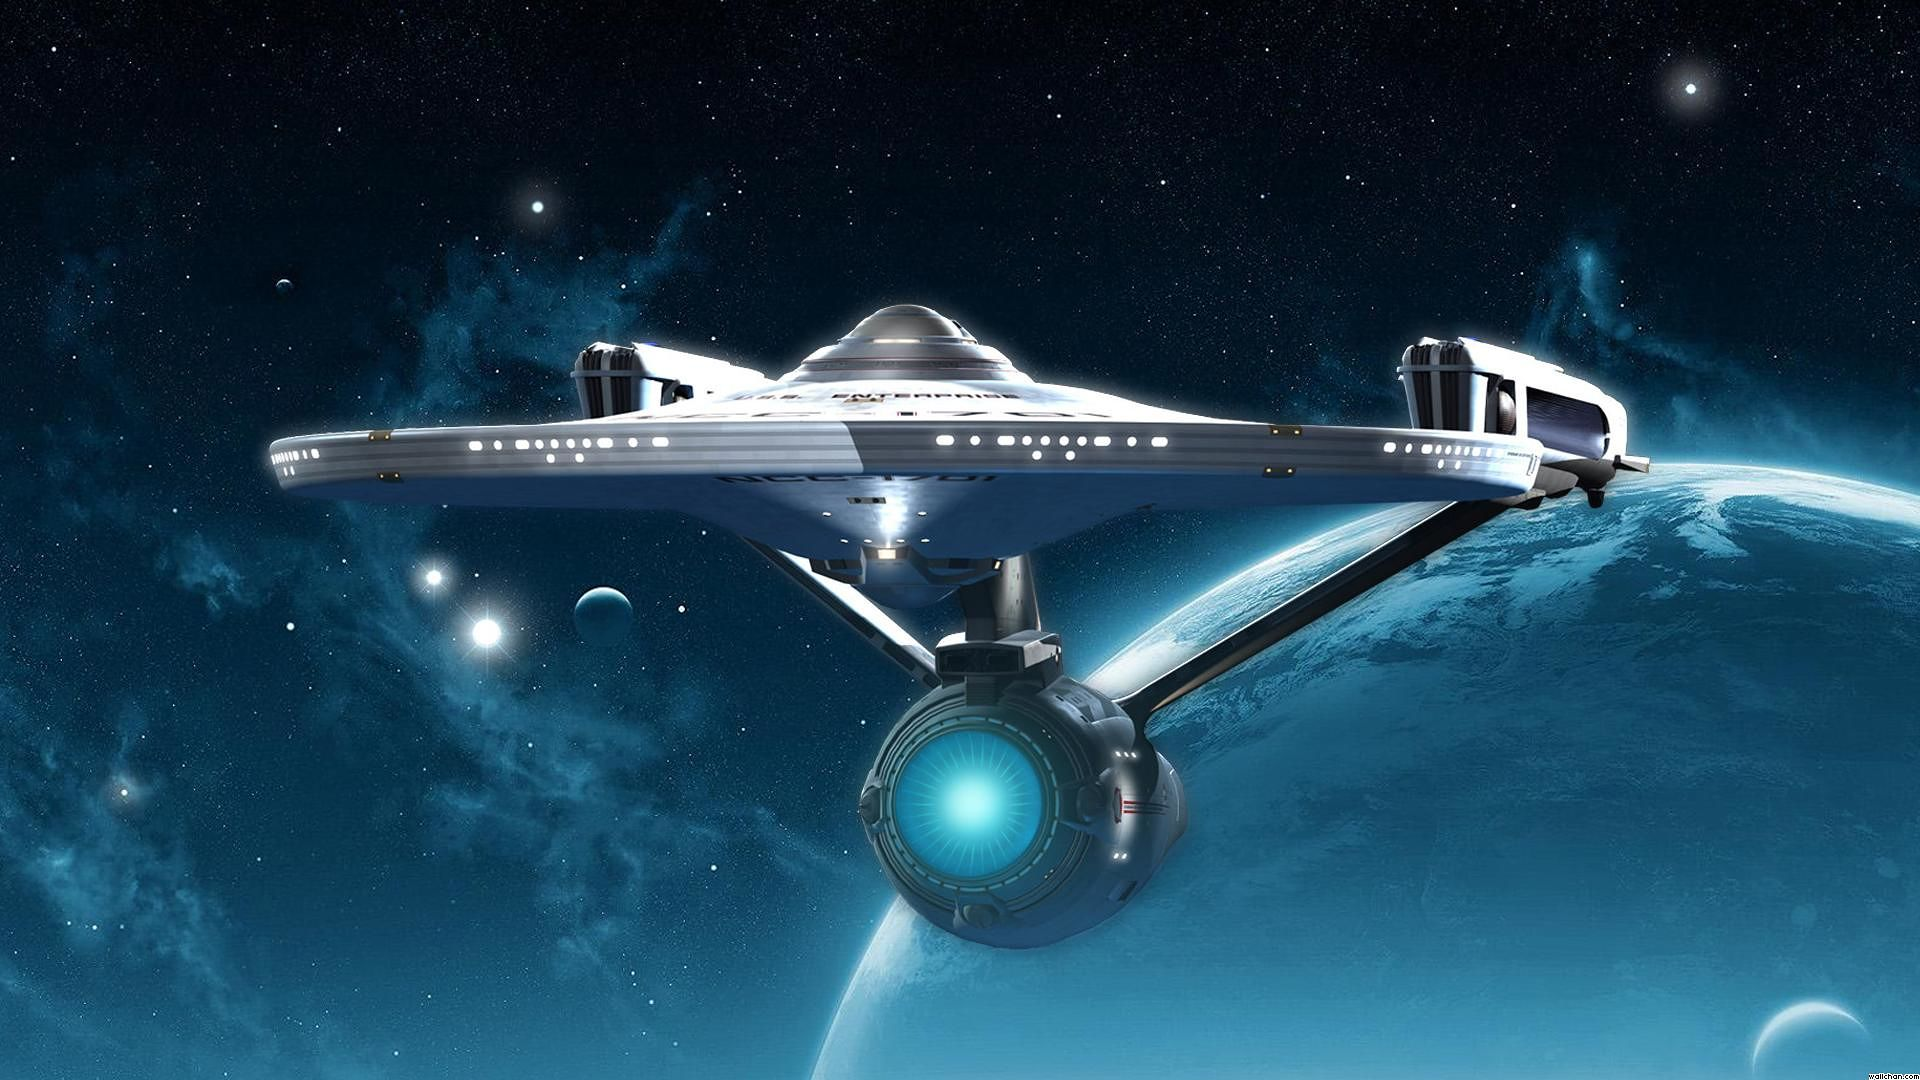 first-star-trek-beyond-images-tease-new-friends-and-new-foes-spoilers-star-trek-3-g-752249.jpg